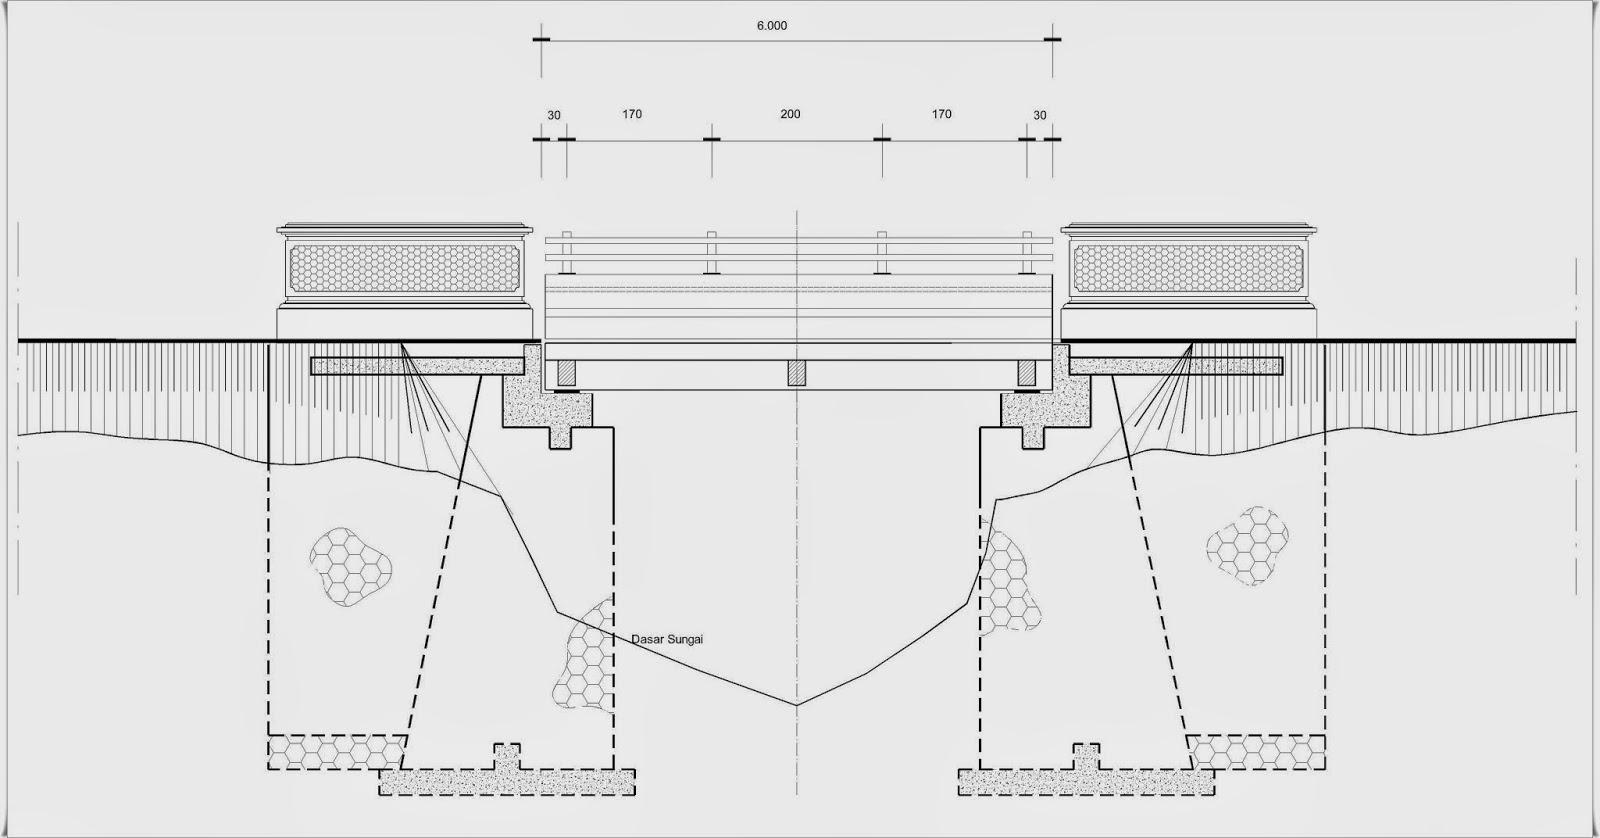 Gambar Besi Plat Lantai Jembatan Pemahaman Tata Letak